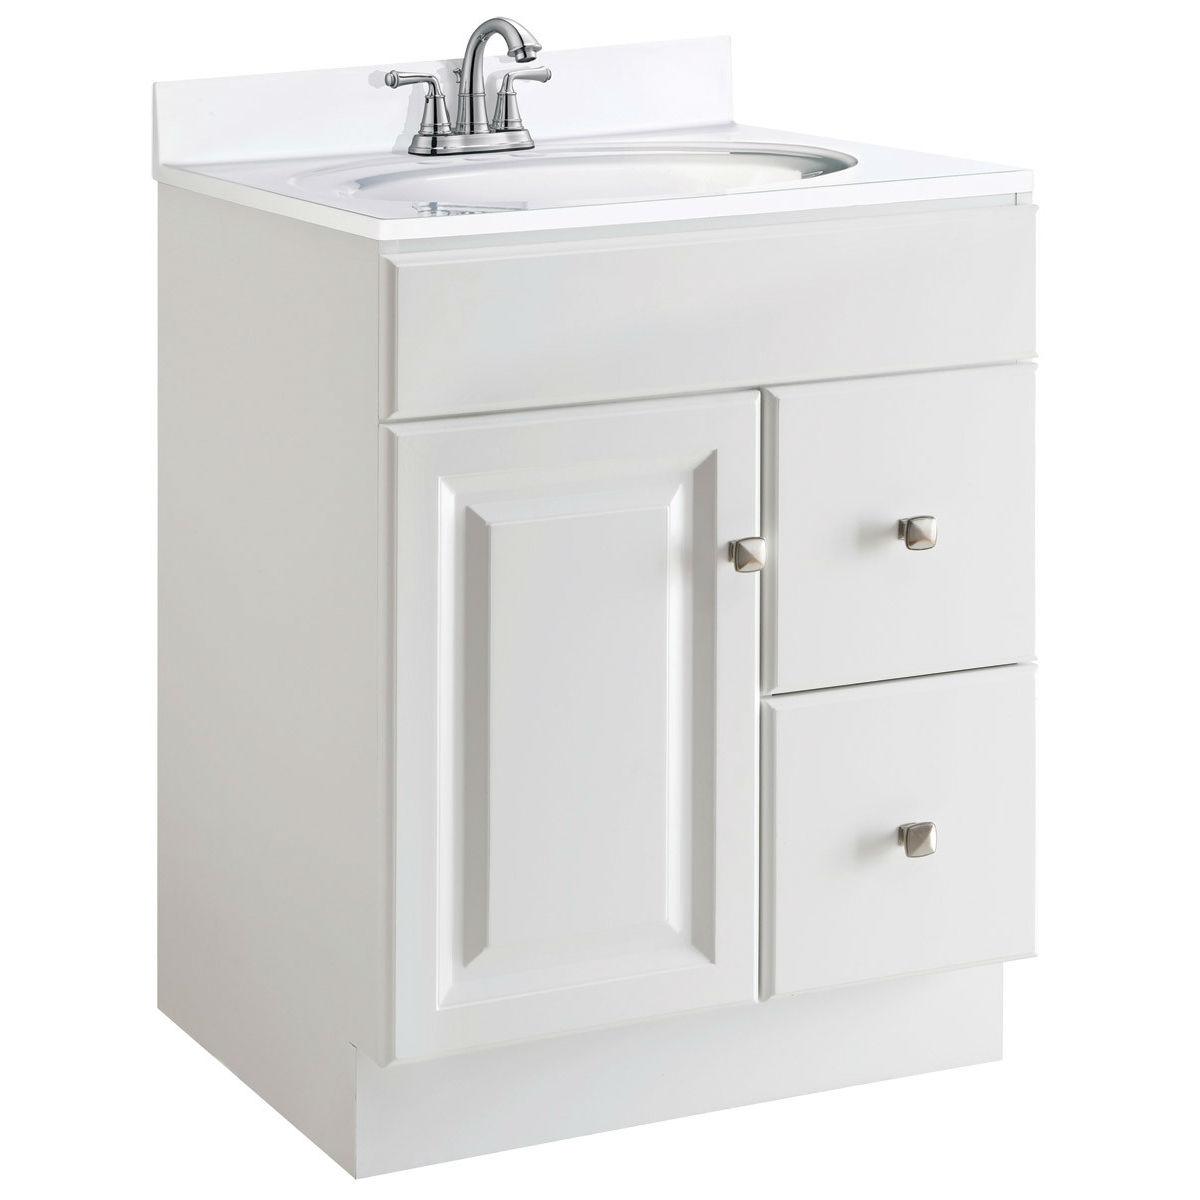 bathroom vanity tray decor.htm 24 inch modern bathroom vanity cabinet base in white semi gloss  24 inch modern bathroom vanity cabinet